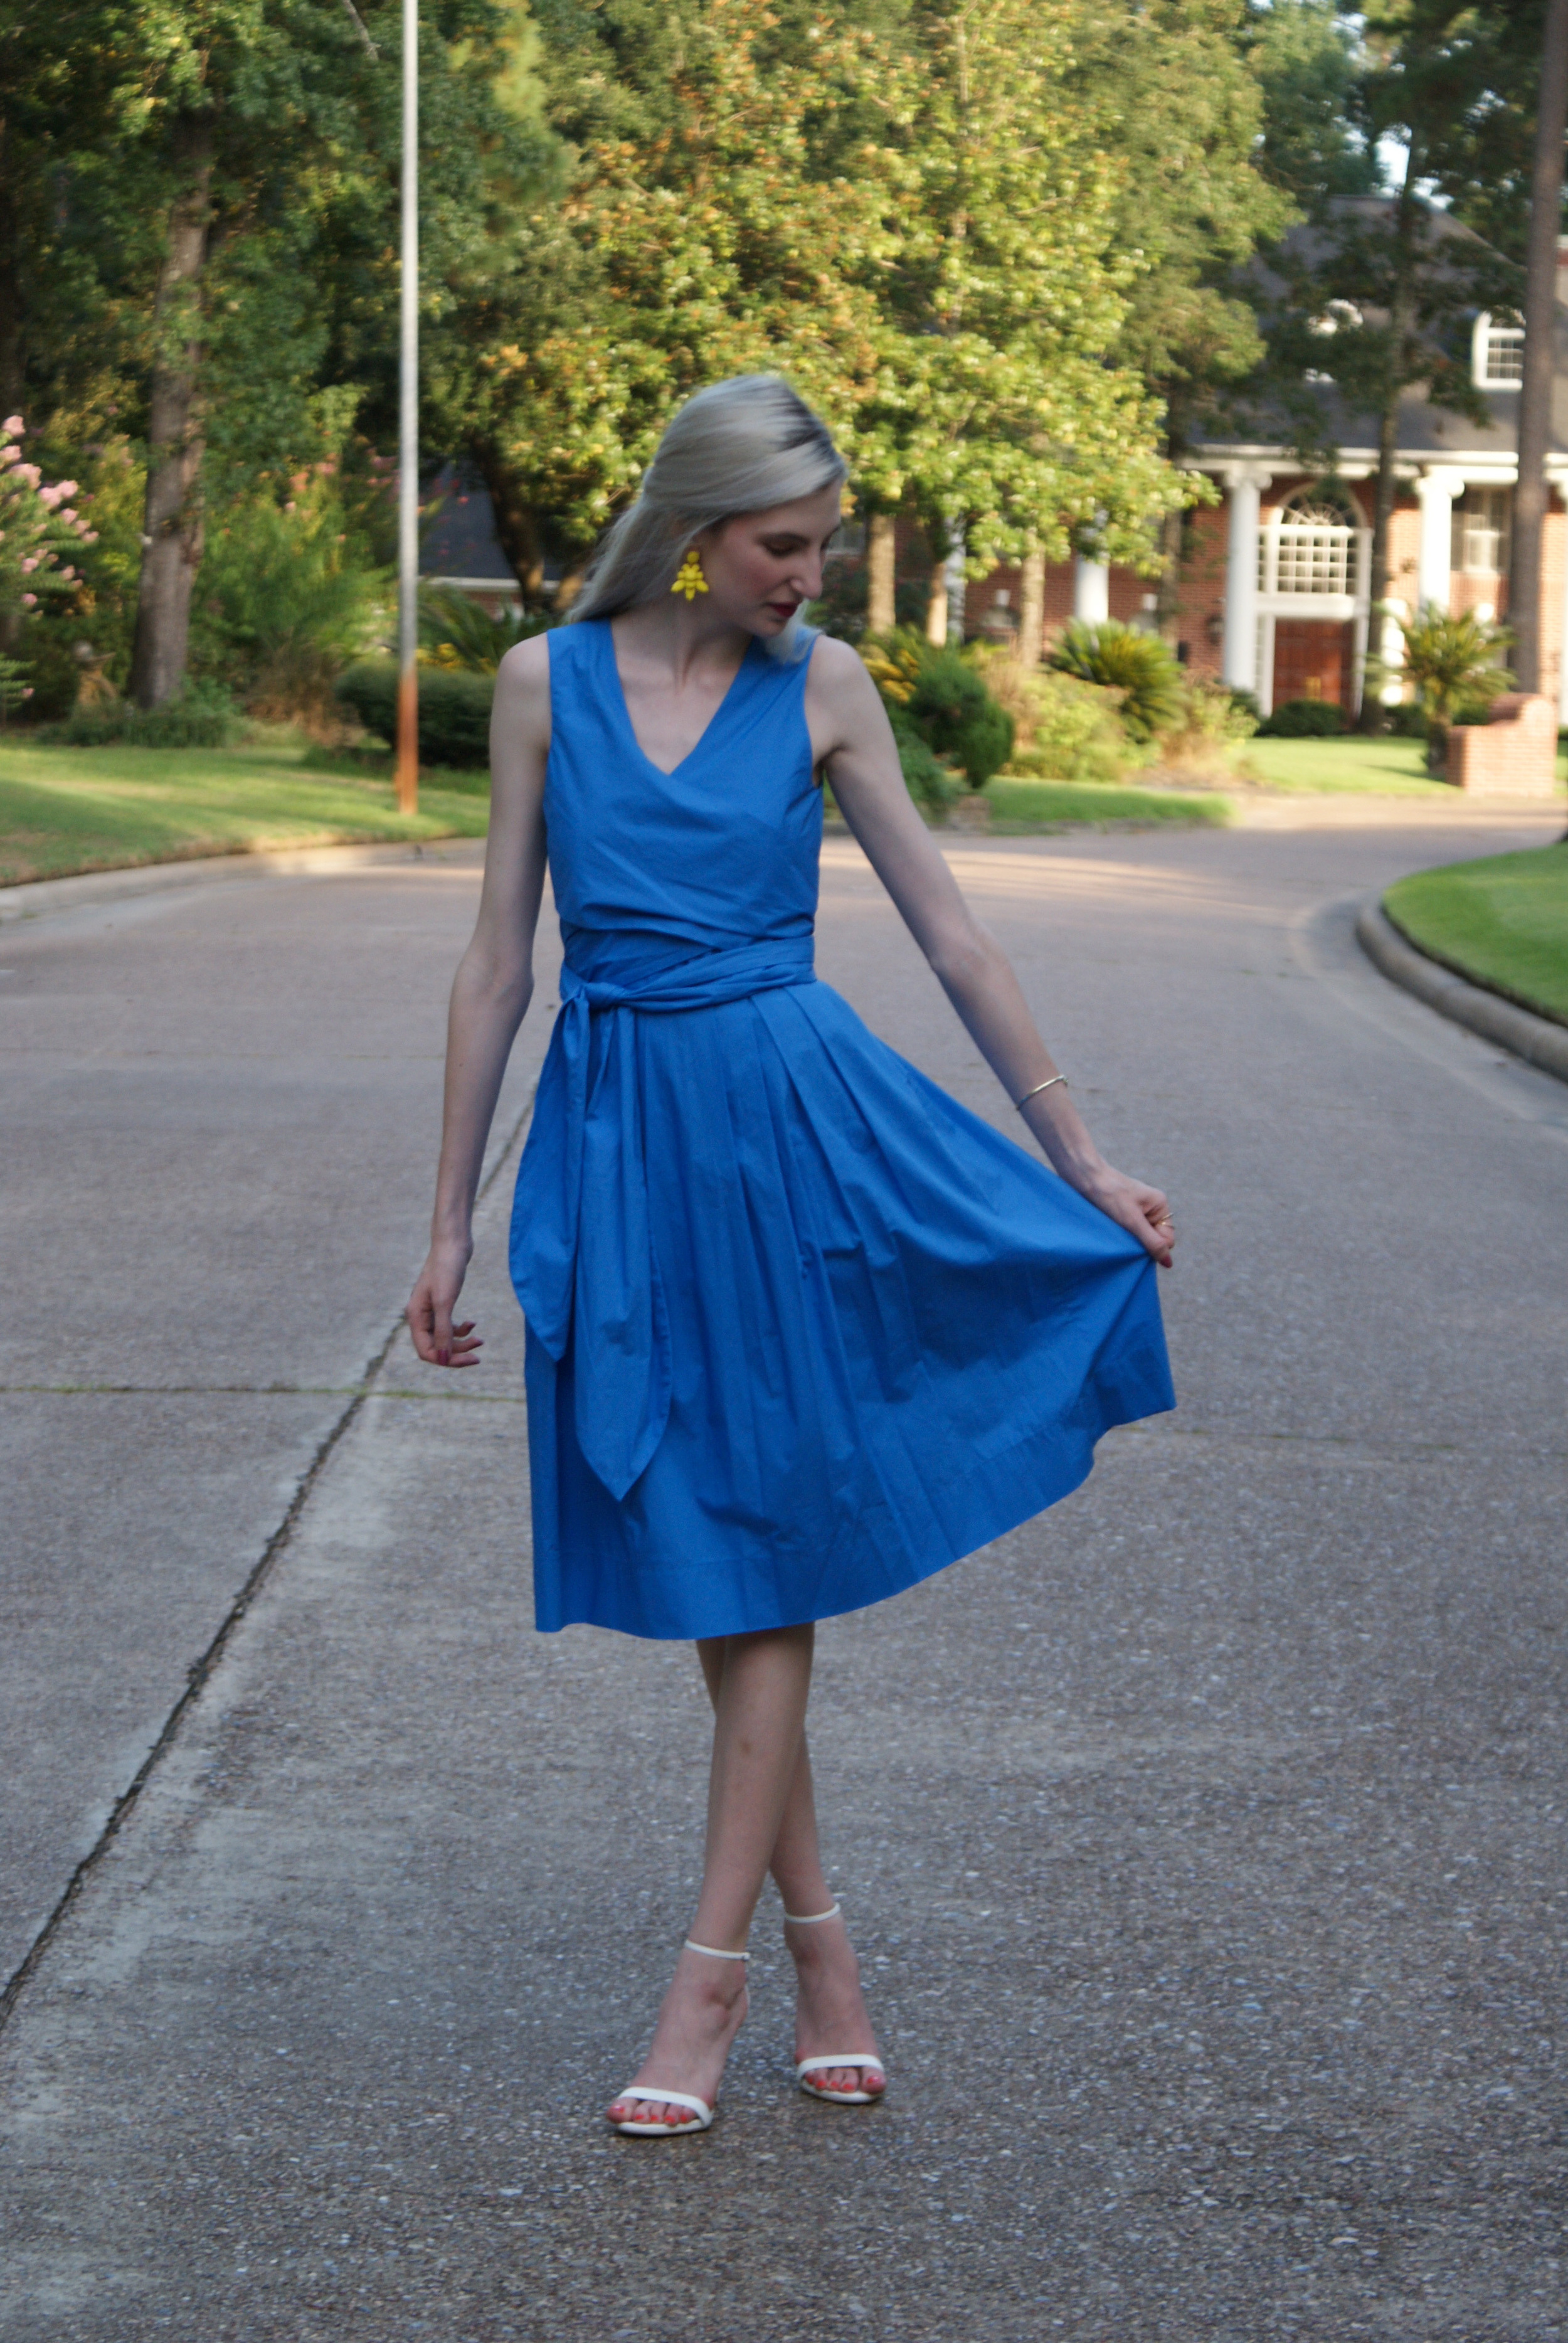 J.Crew blue wrap dress, J.Crew yellow statement earrings, white steve madden stecy ankle strap heeled sandal, kendra scott andy station cuff, revlon ultra hd matte lipstick in devotion